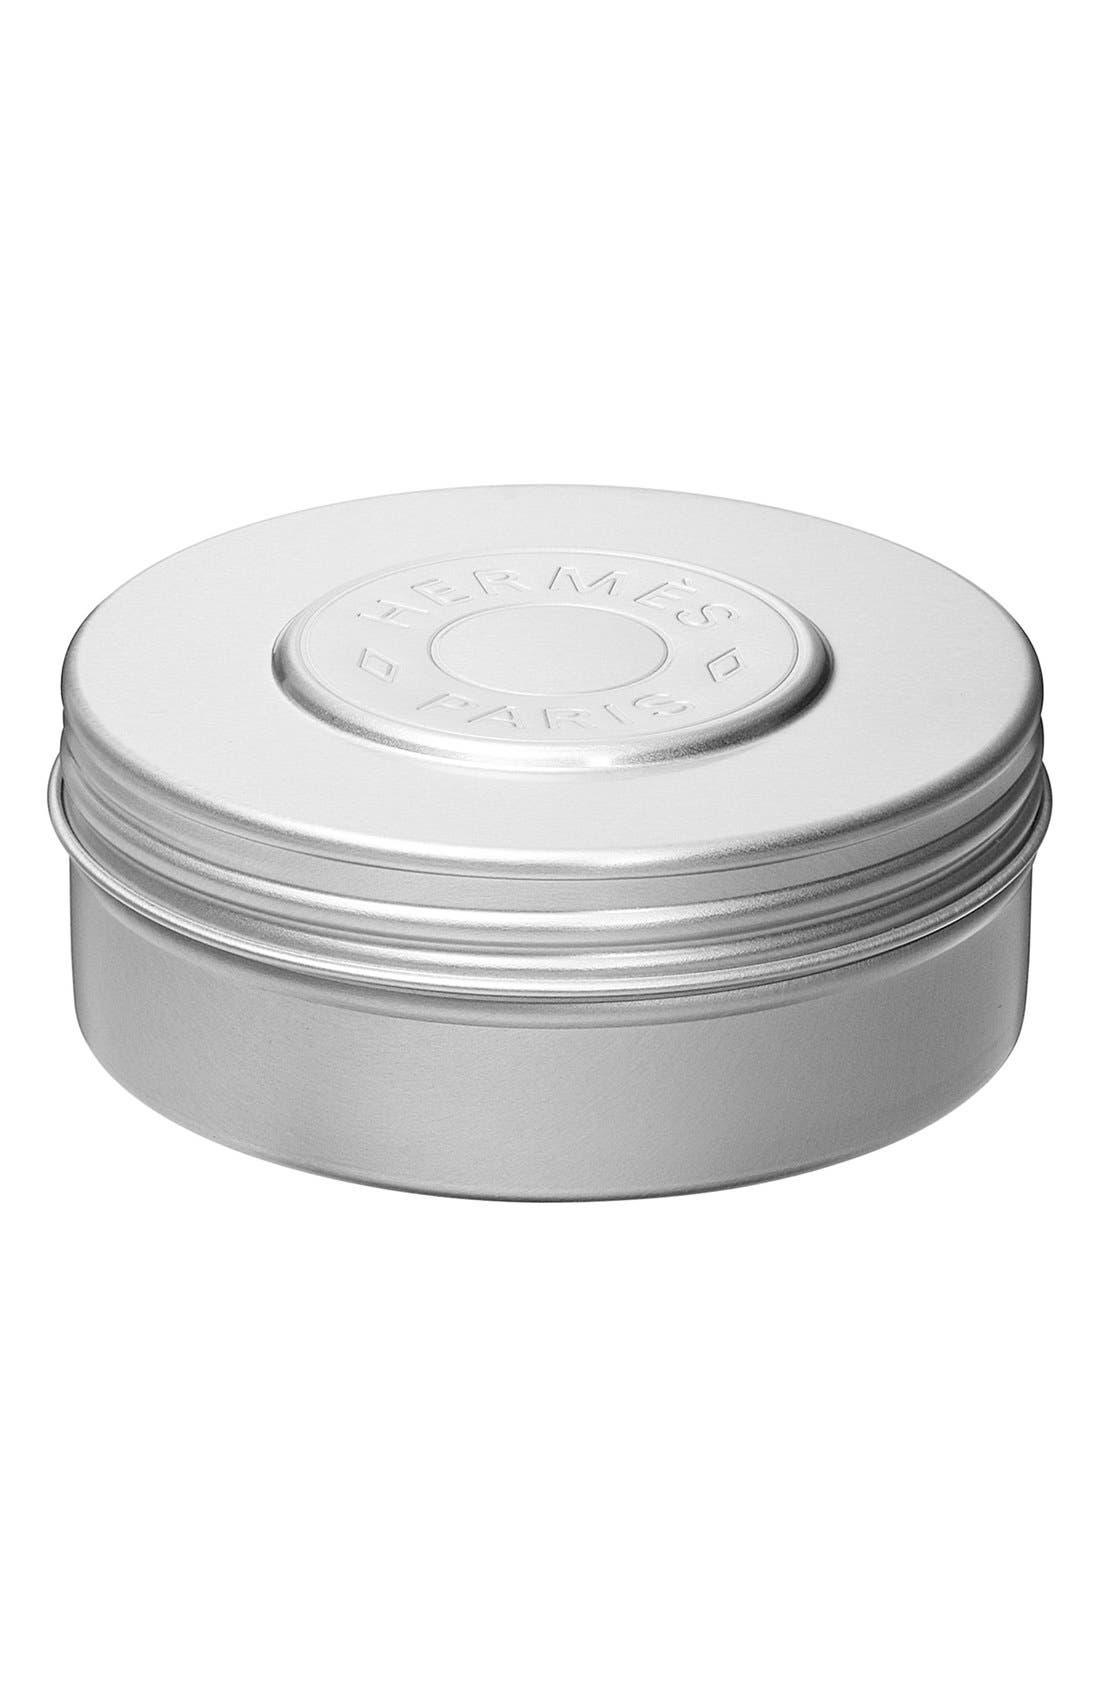 Hermès Eau d'Orange Verte - Face and body moisturizing balm